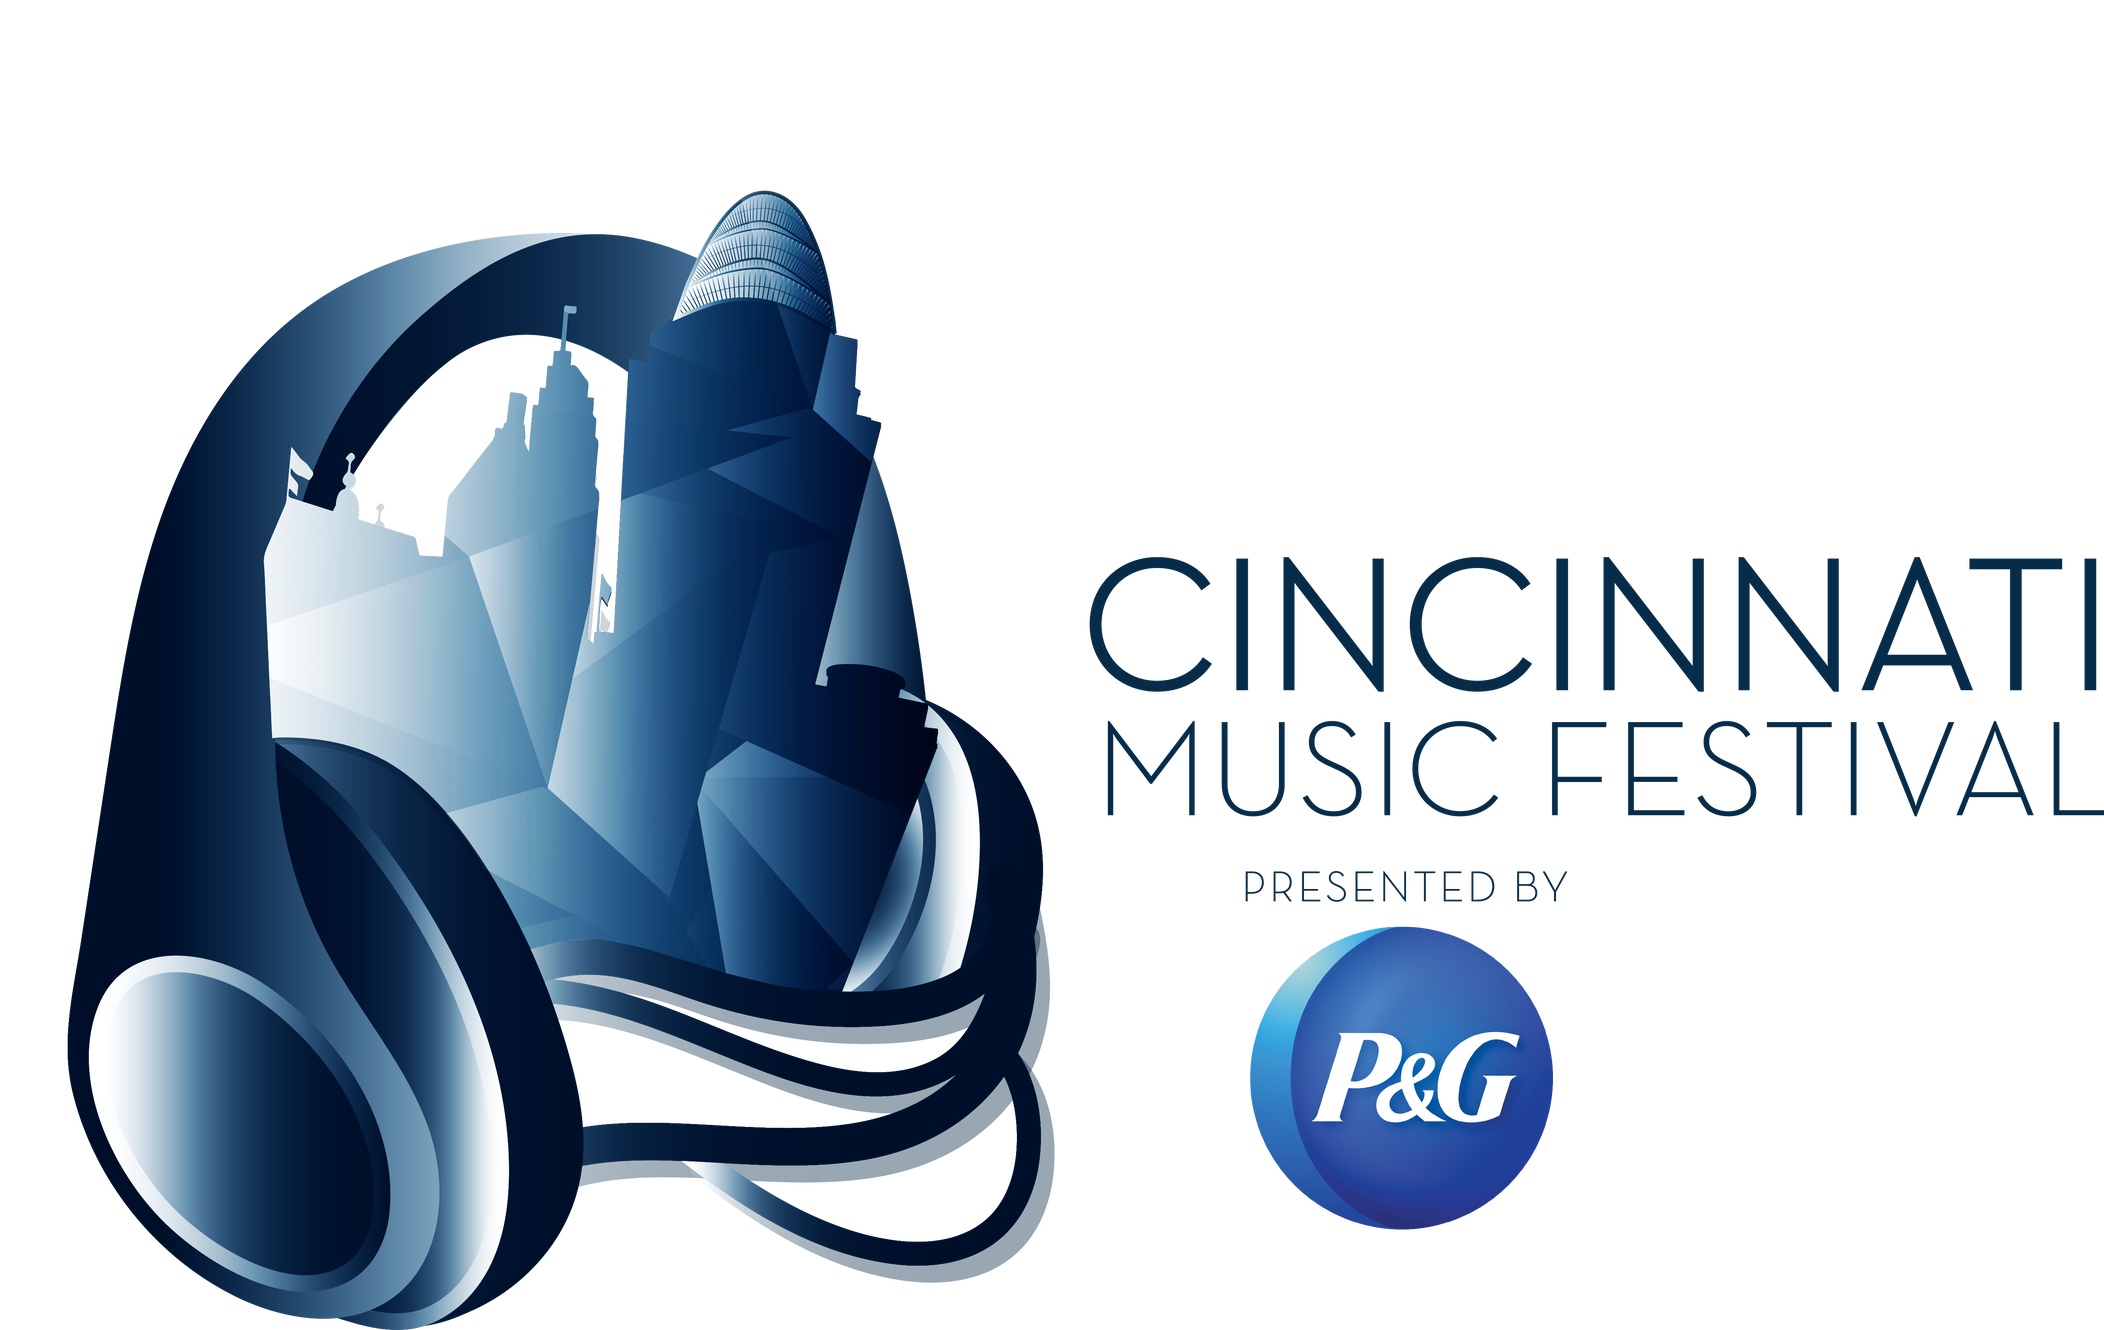 Cincinnati Music Festival 2020